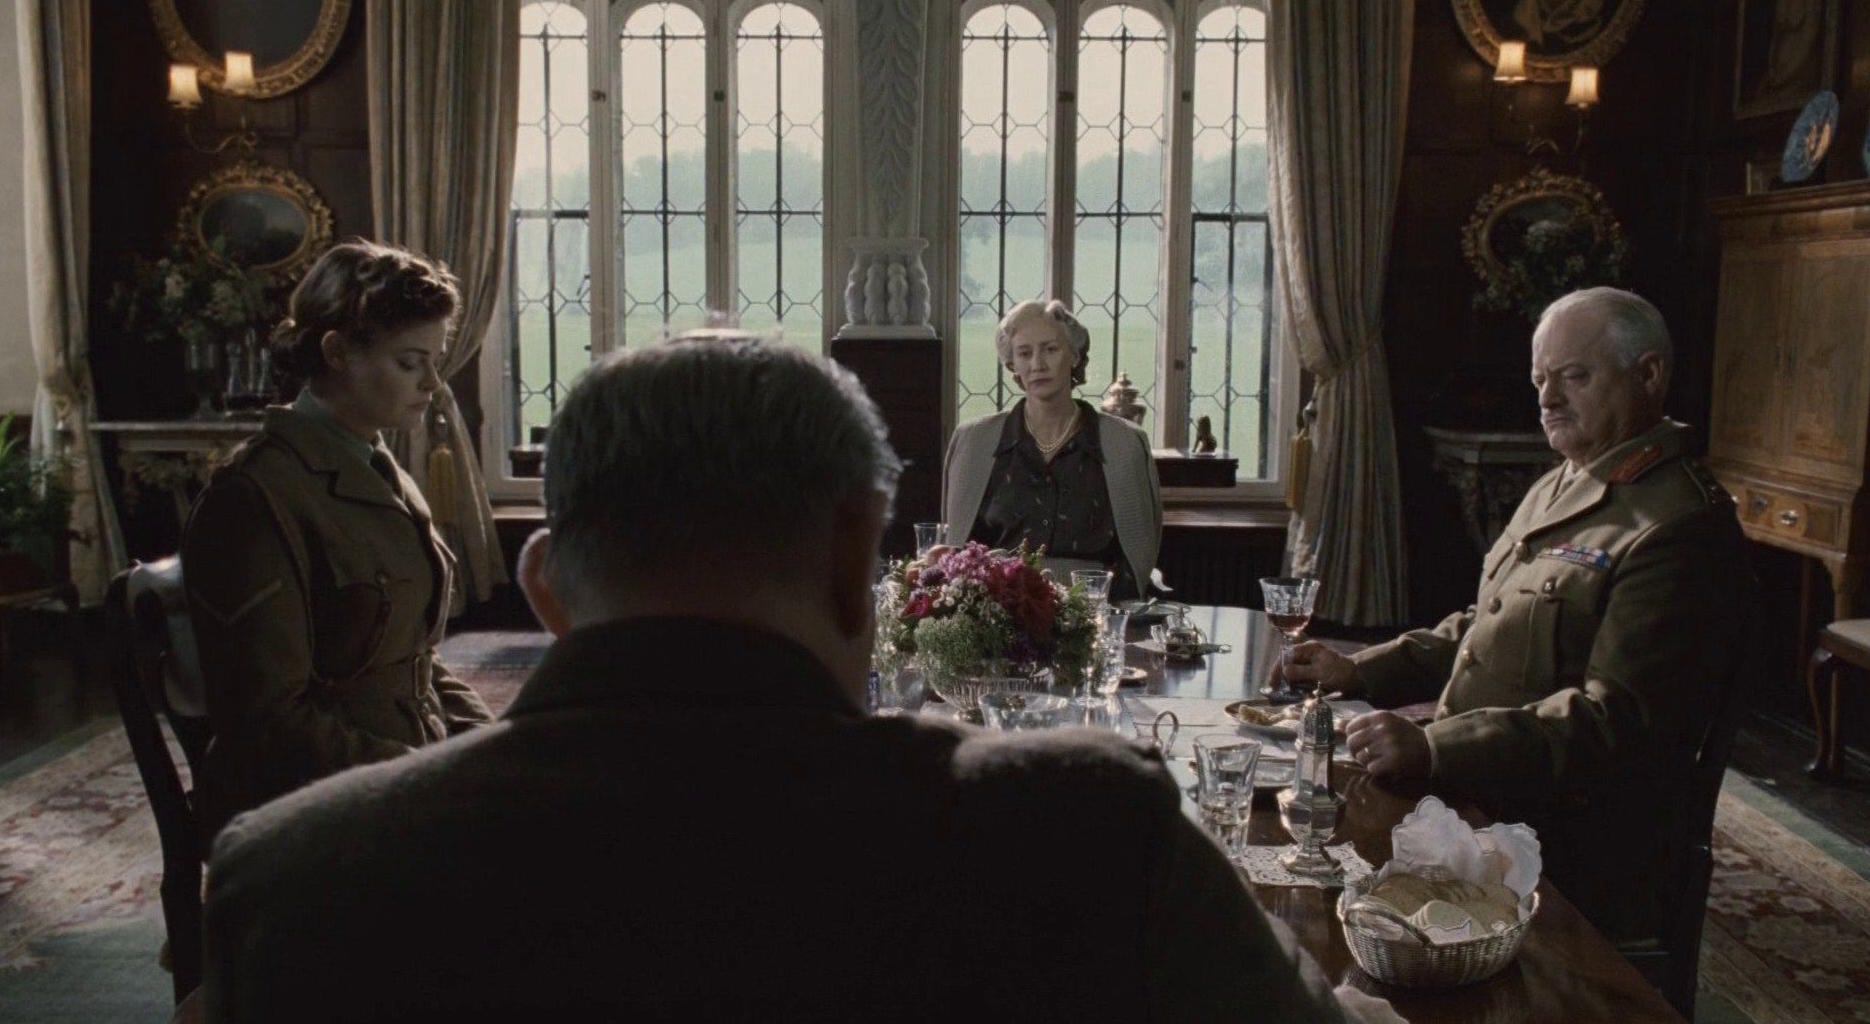 INTO THE STORM  by Thaddeus O'Sullivan  FILM/